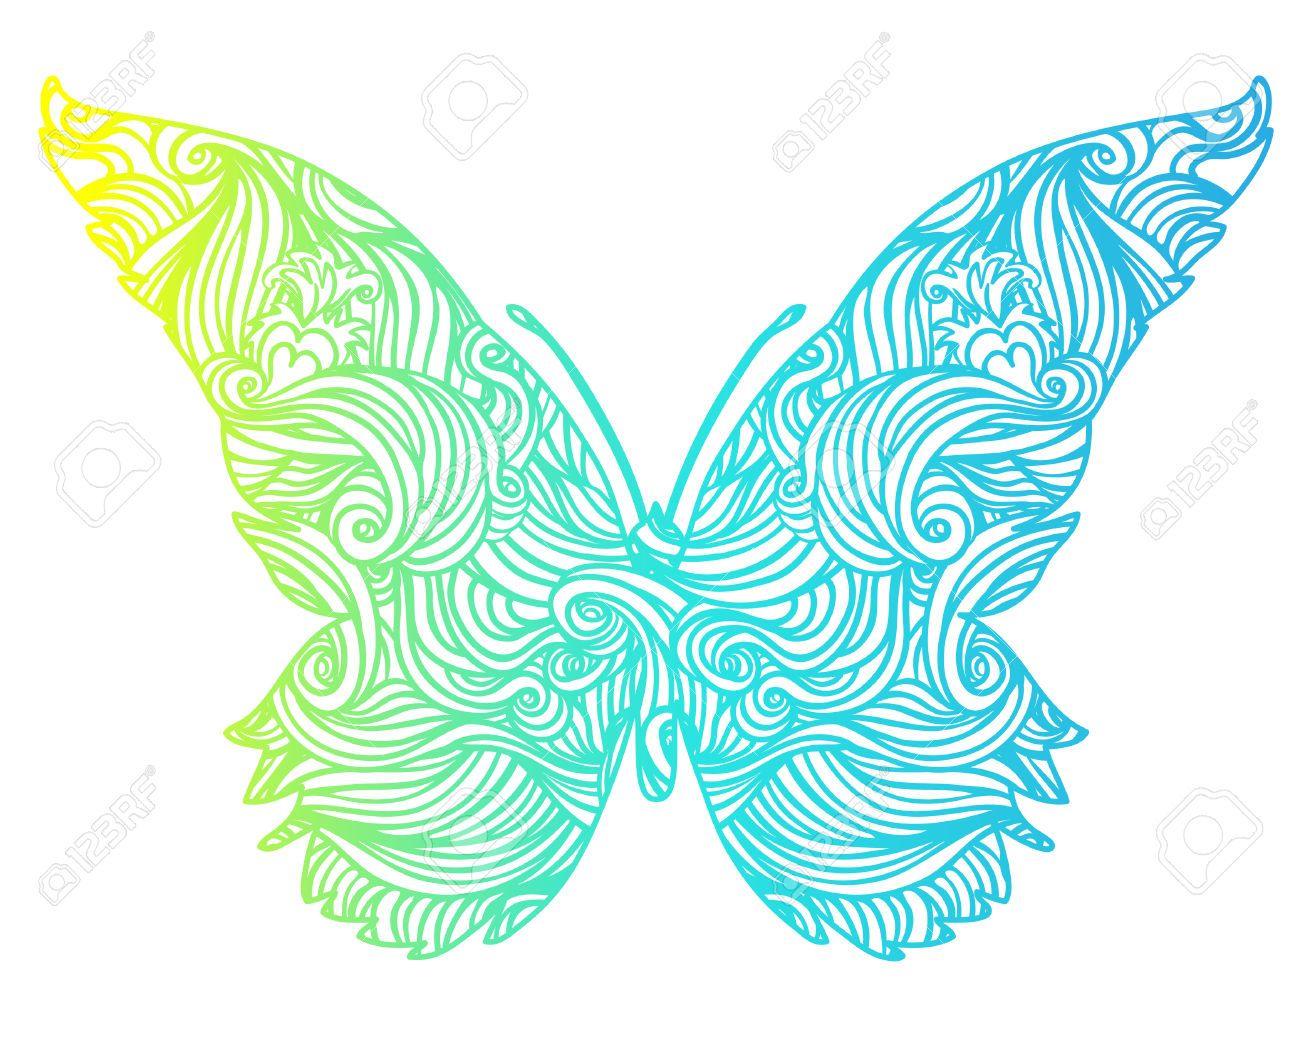 The Paisley papillon - Google Search